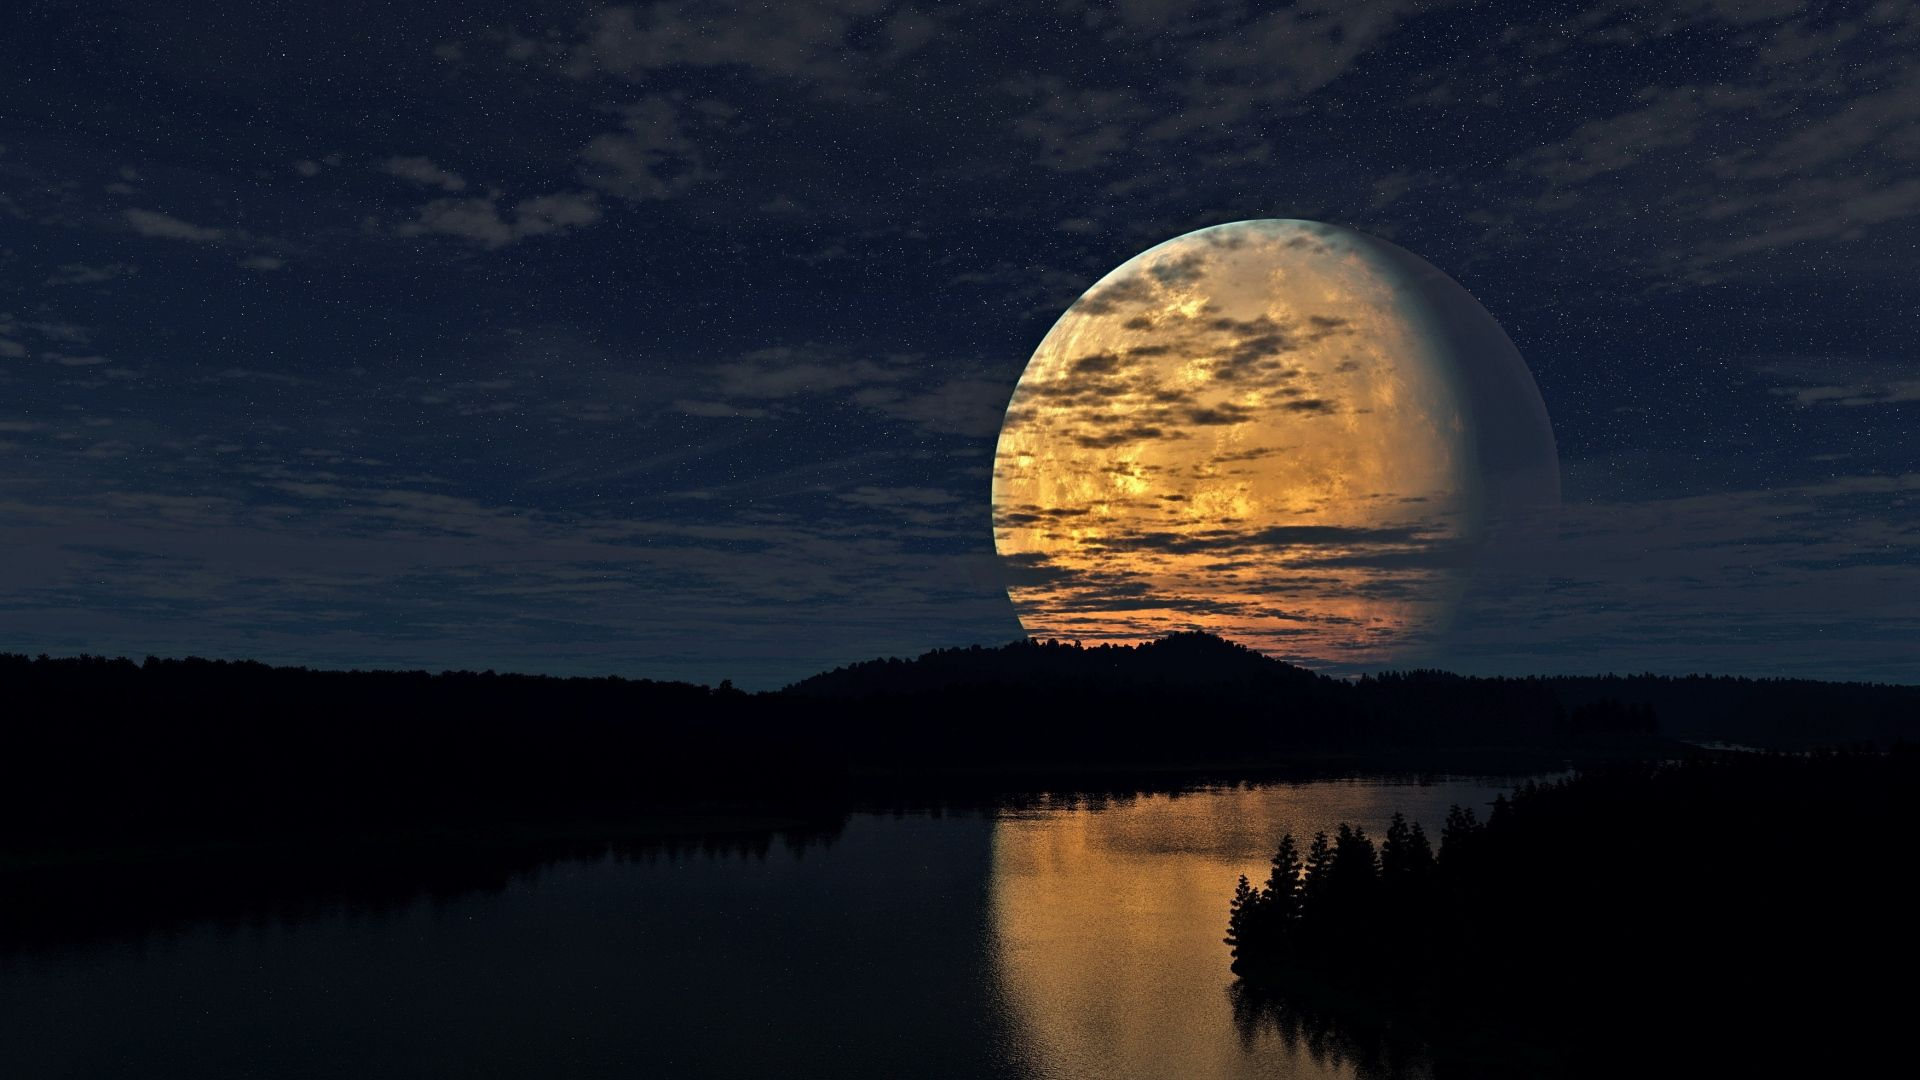 Download Wallpaper 1920x1080 Night Sky Moon Trees River